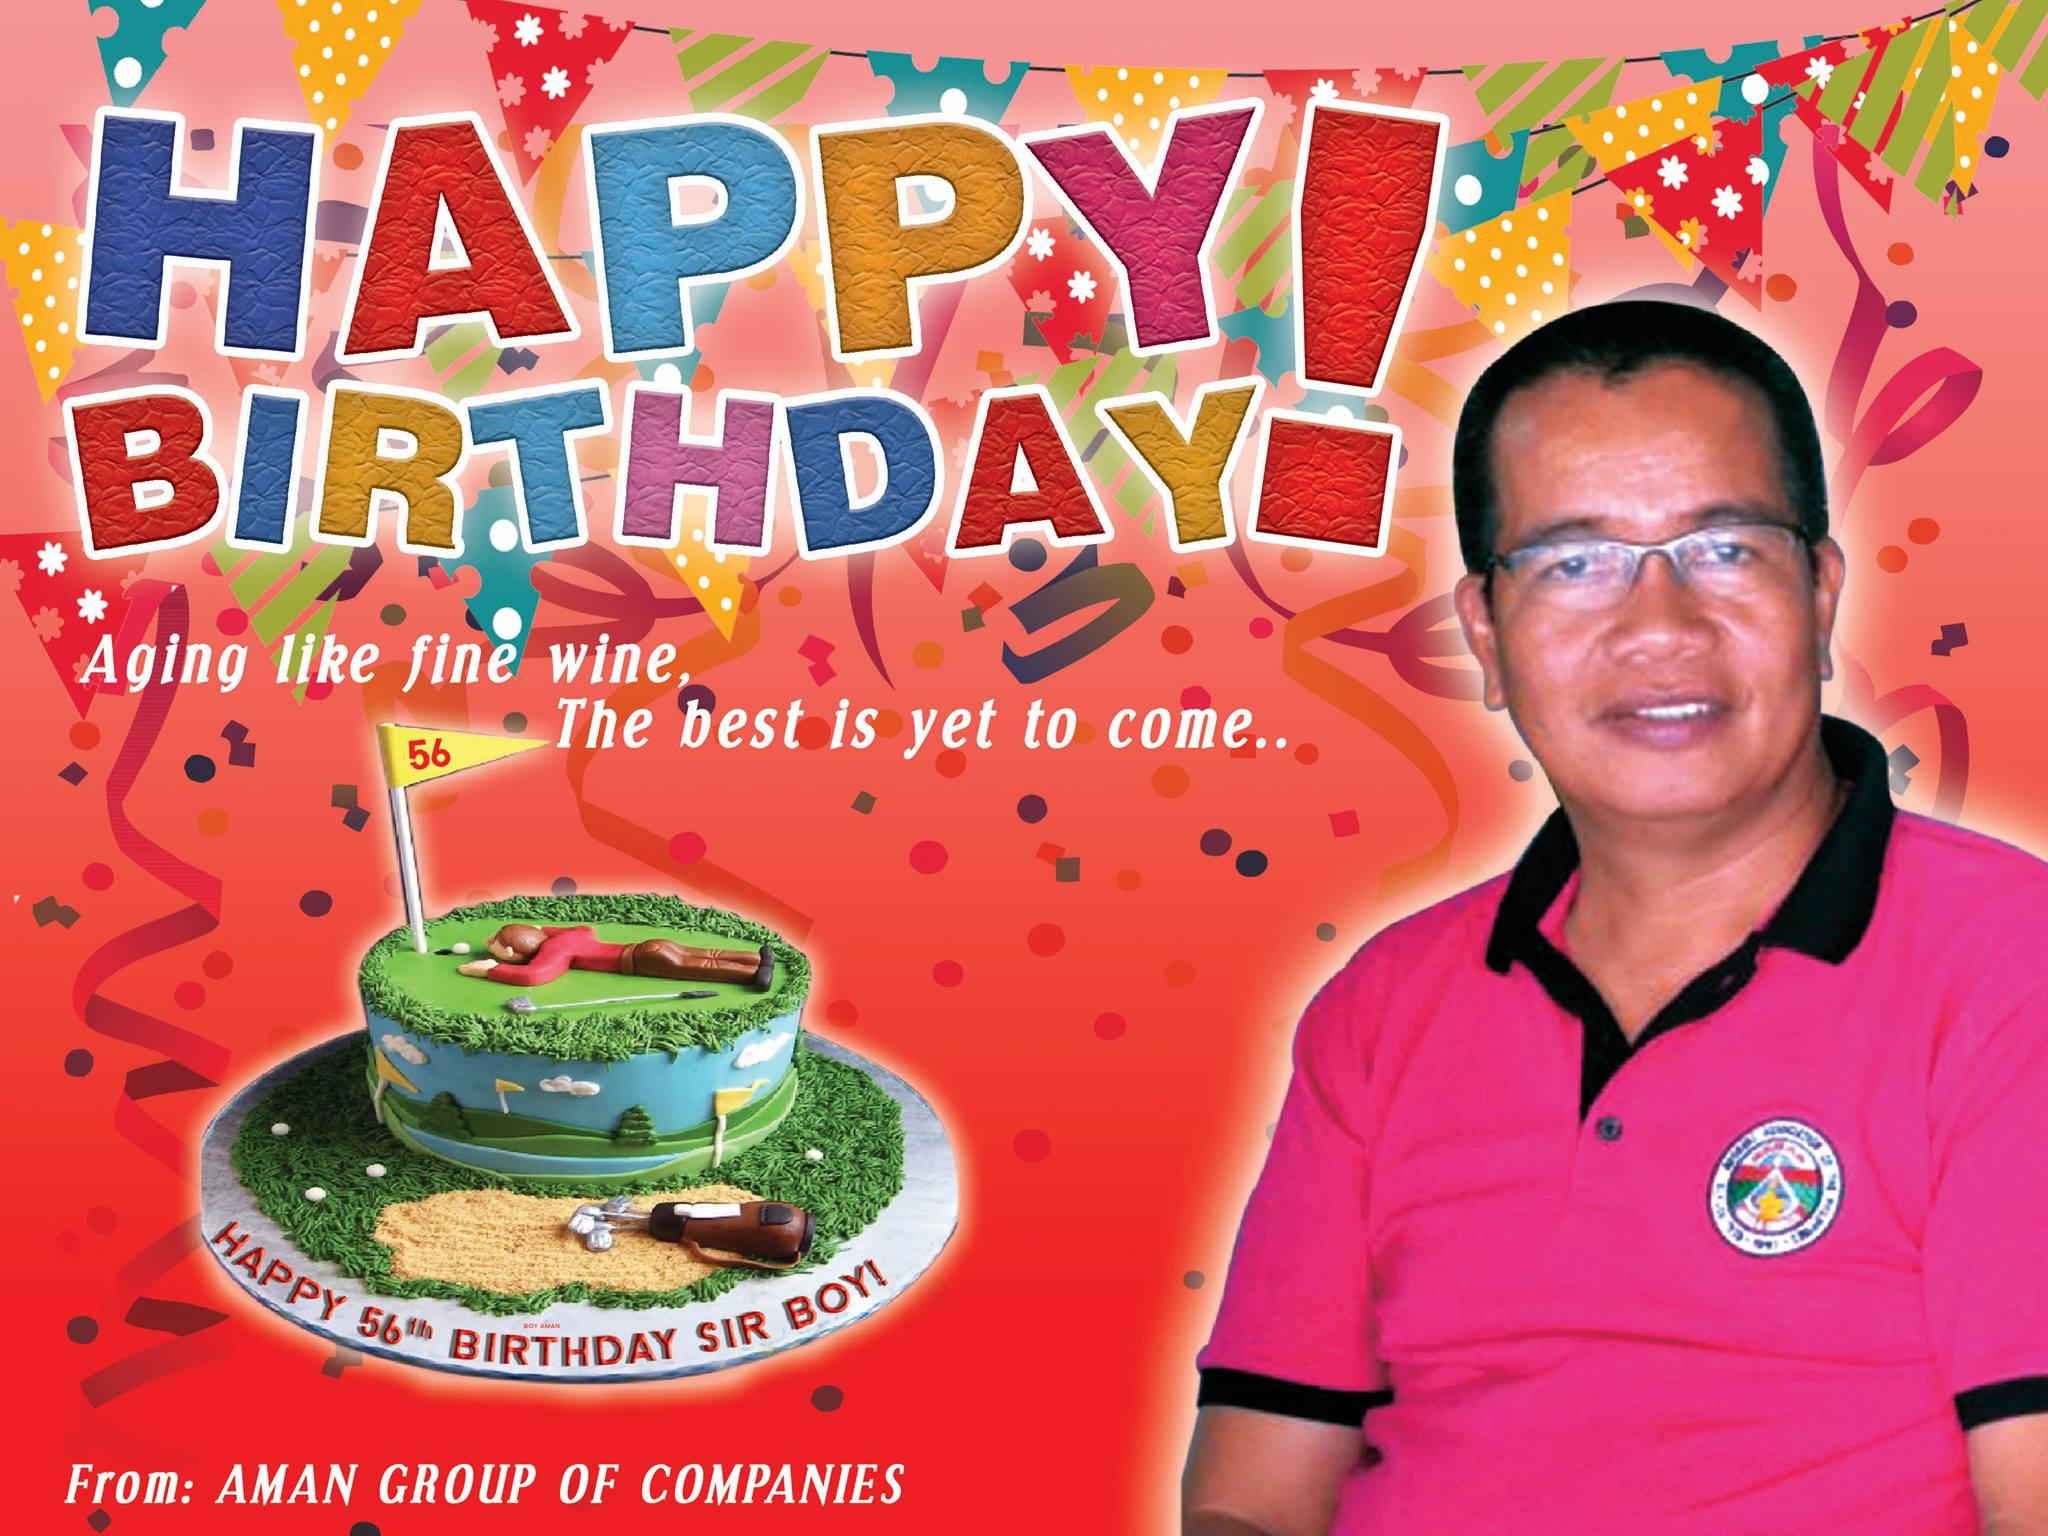 Happy birthday Engineer Boy Aman